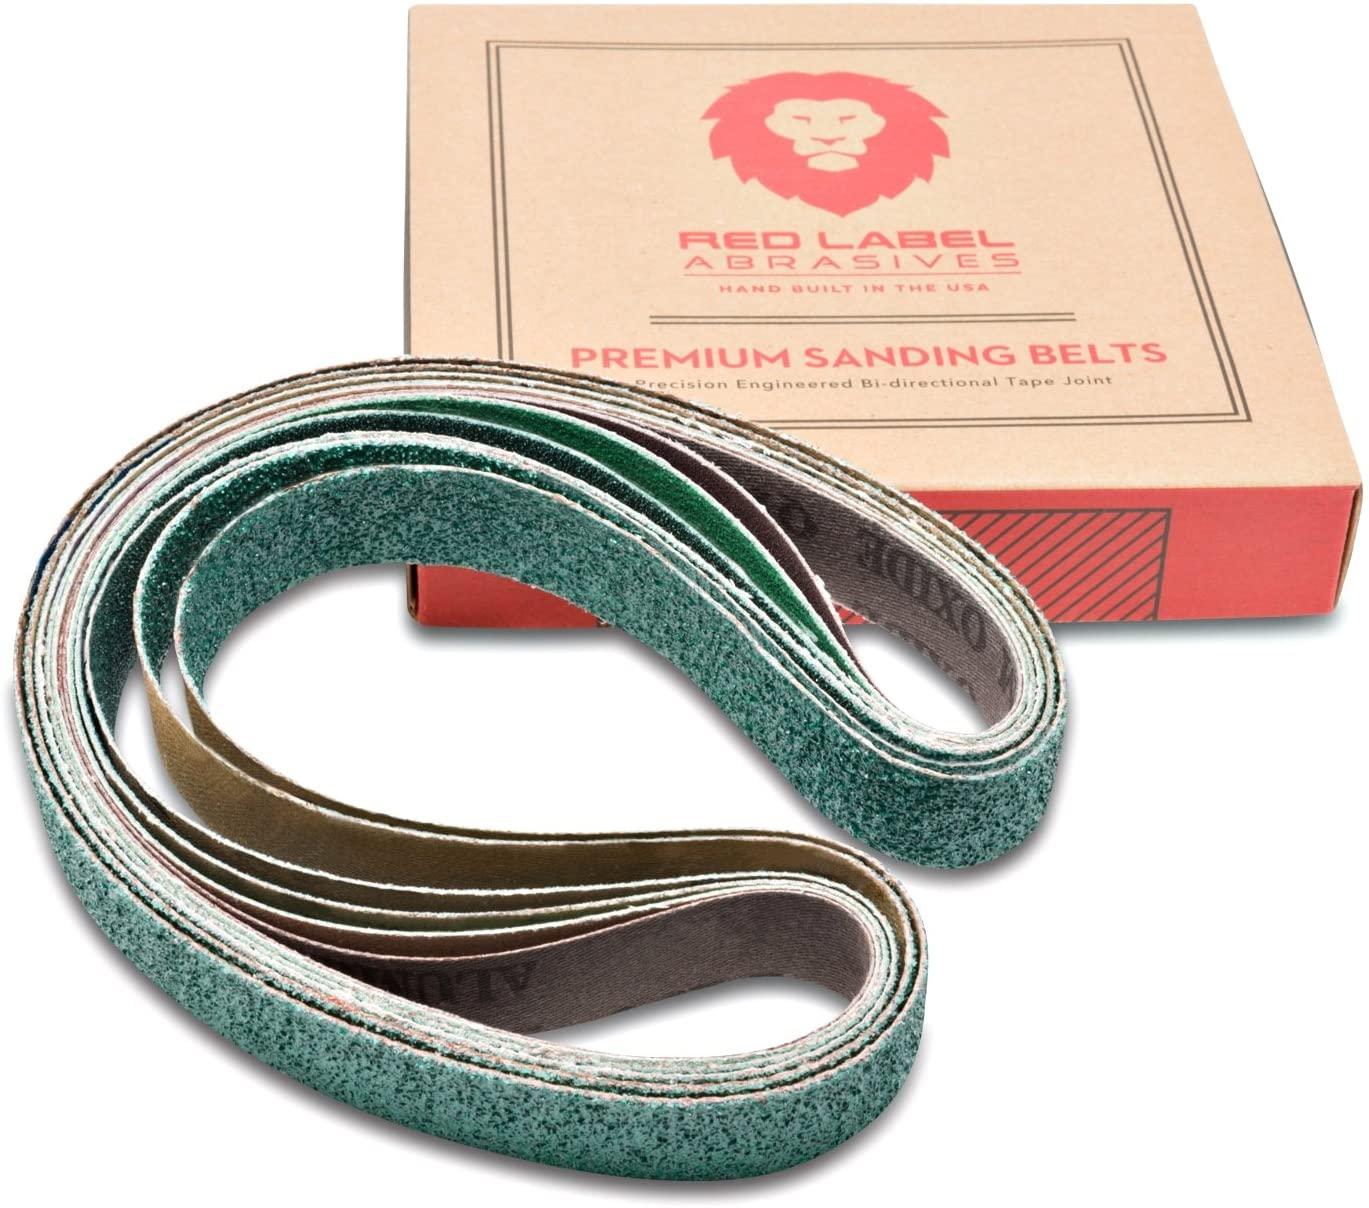 1 x 30 Knife Makers Coarse Grit Sanding Belts, 6 Pack Assortment